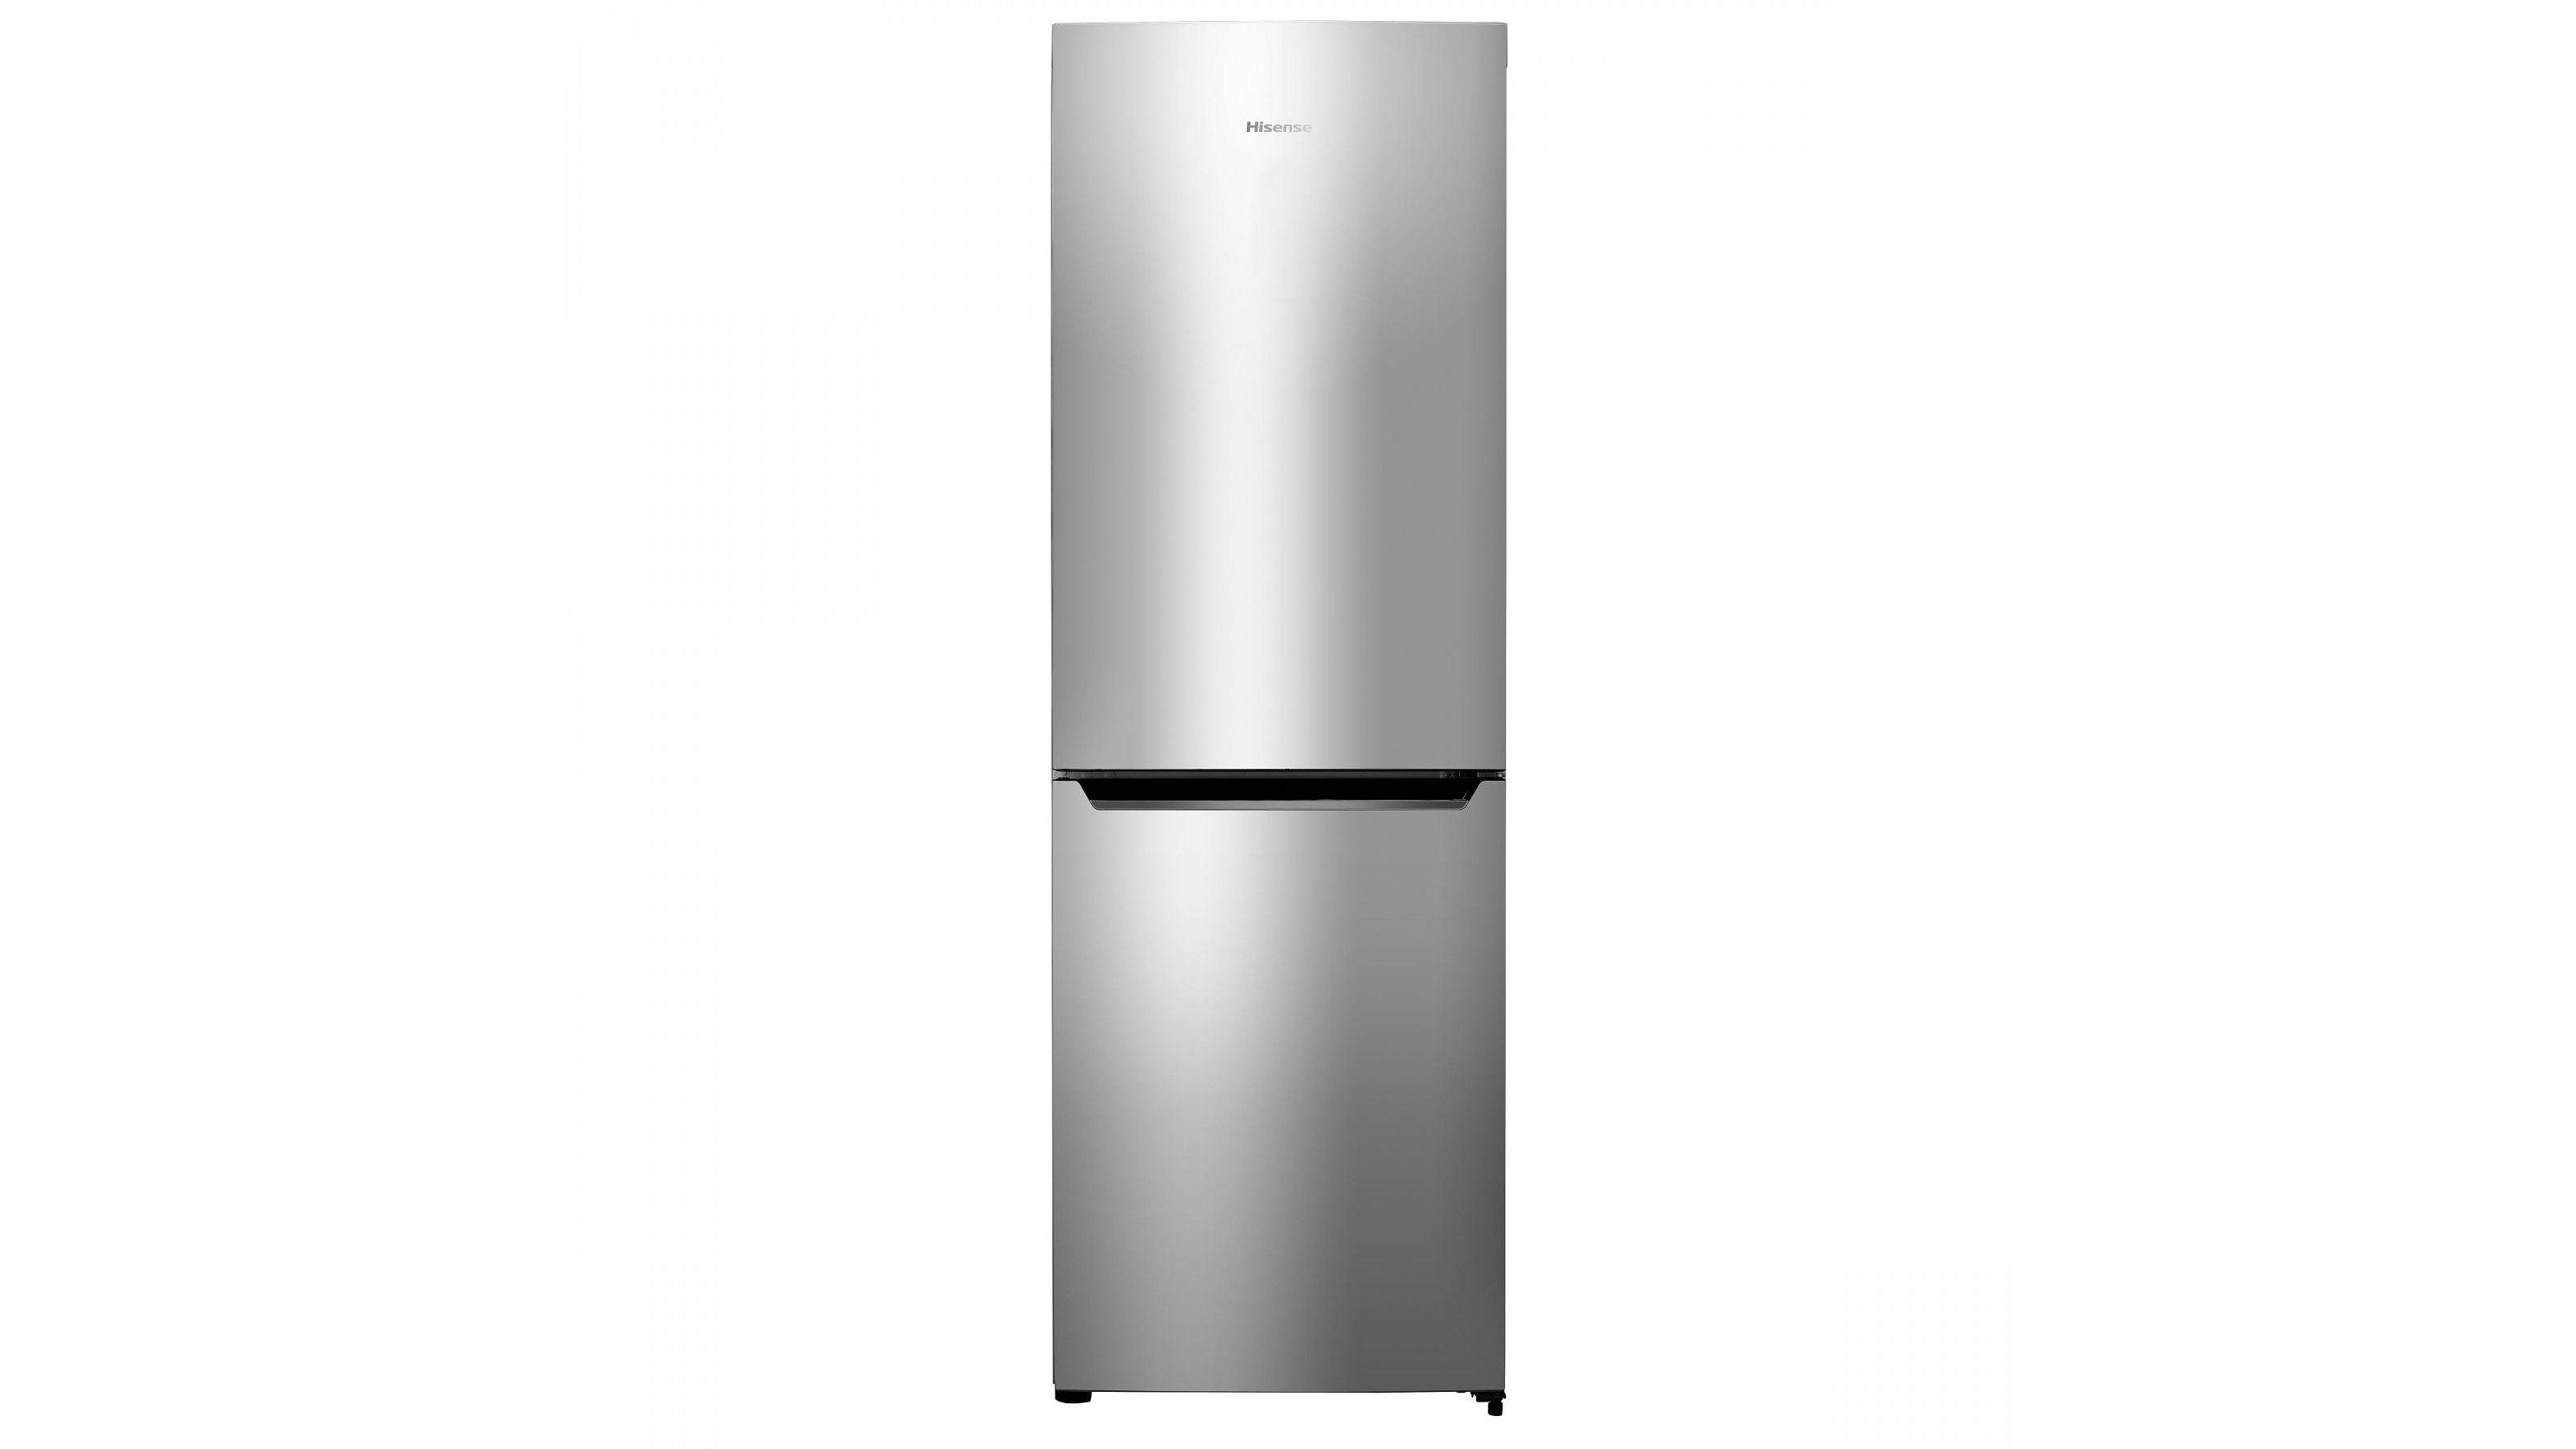 Hisense 320l Bottom Mount Fridge Modern Kitchen Storage Spaces Household